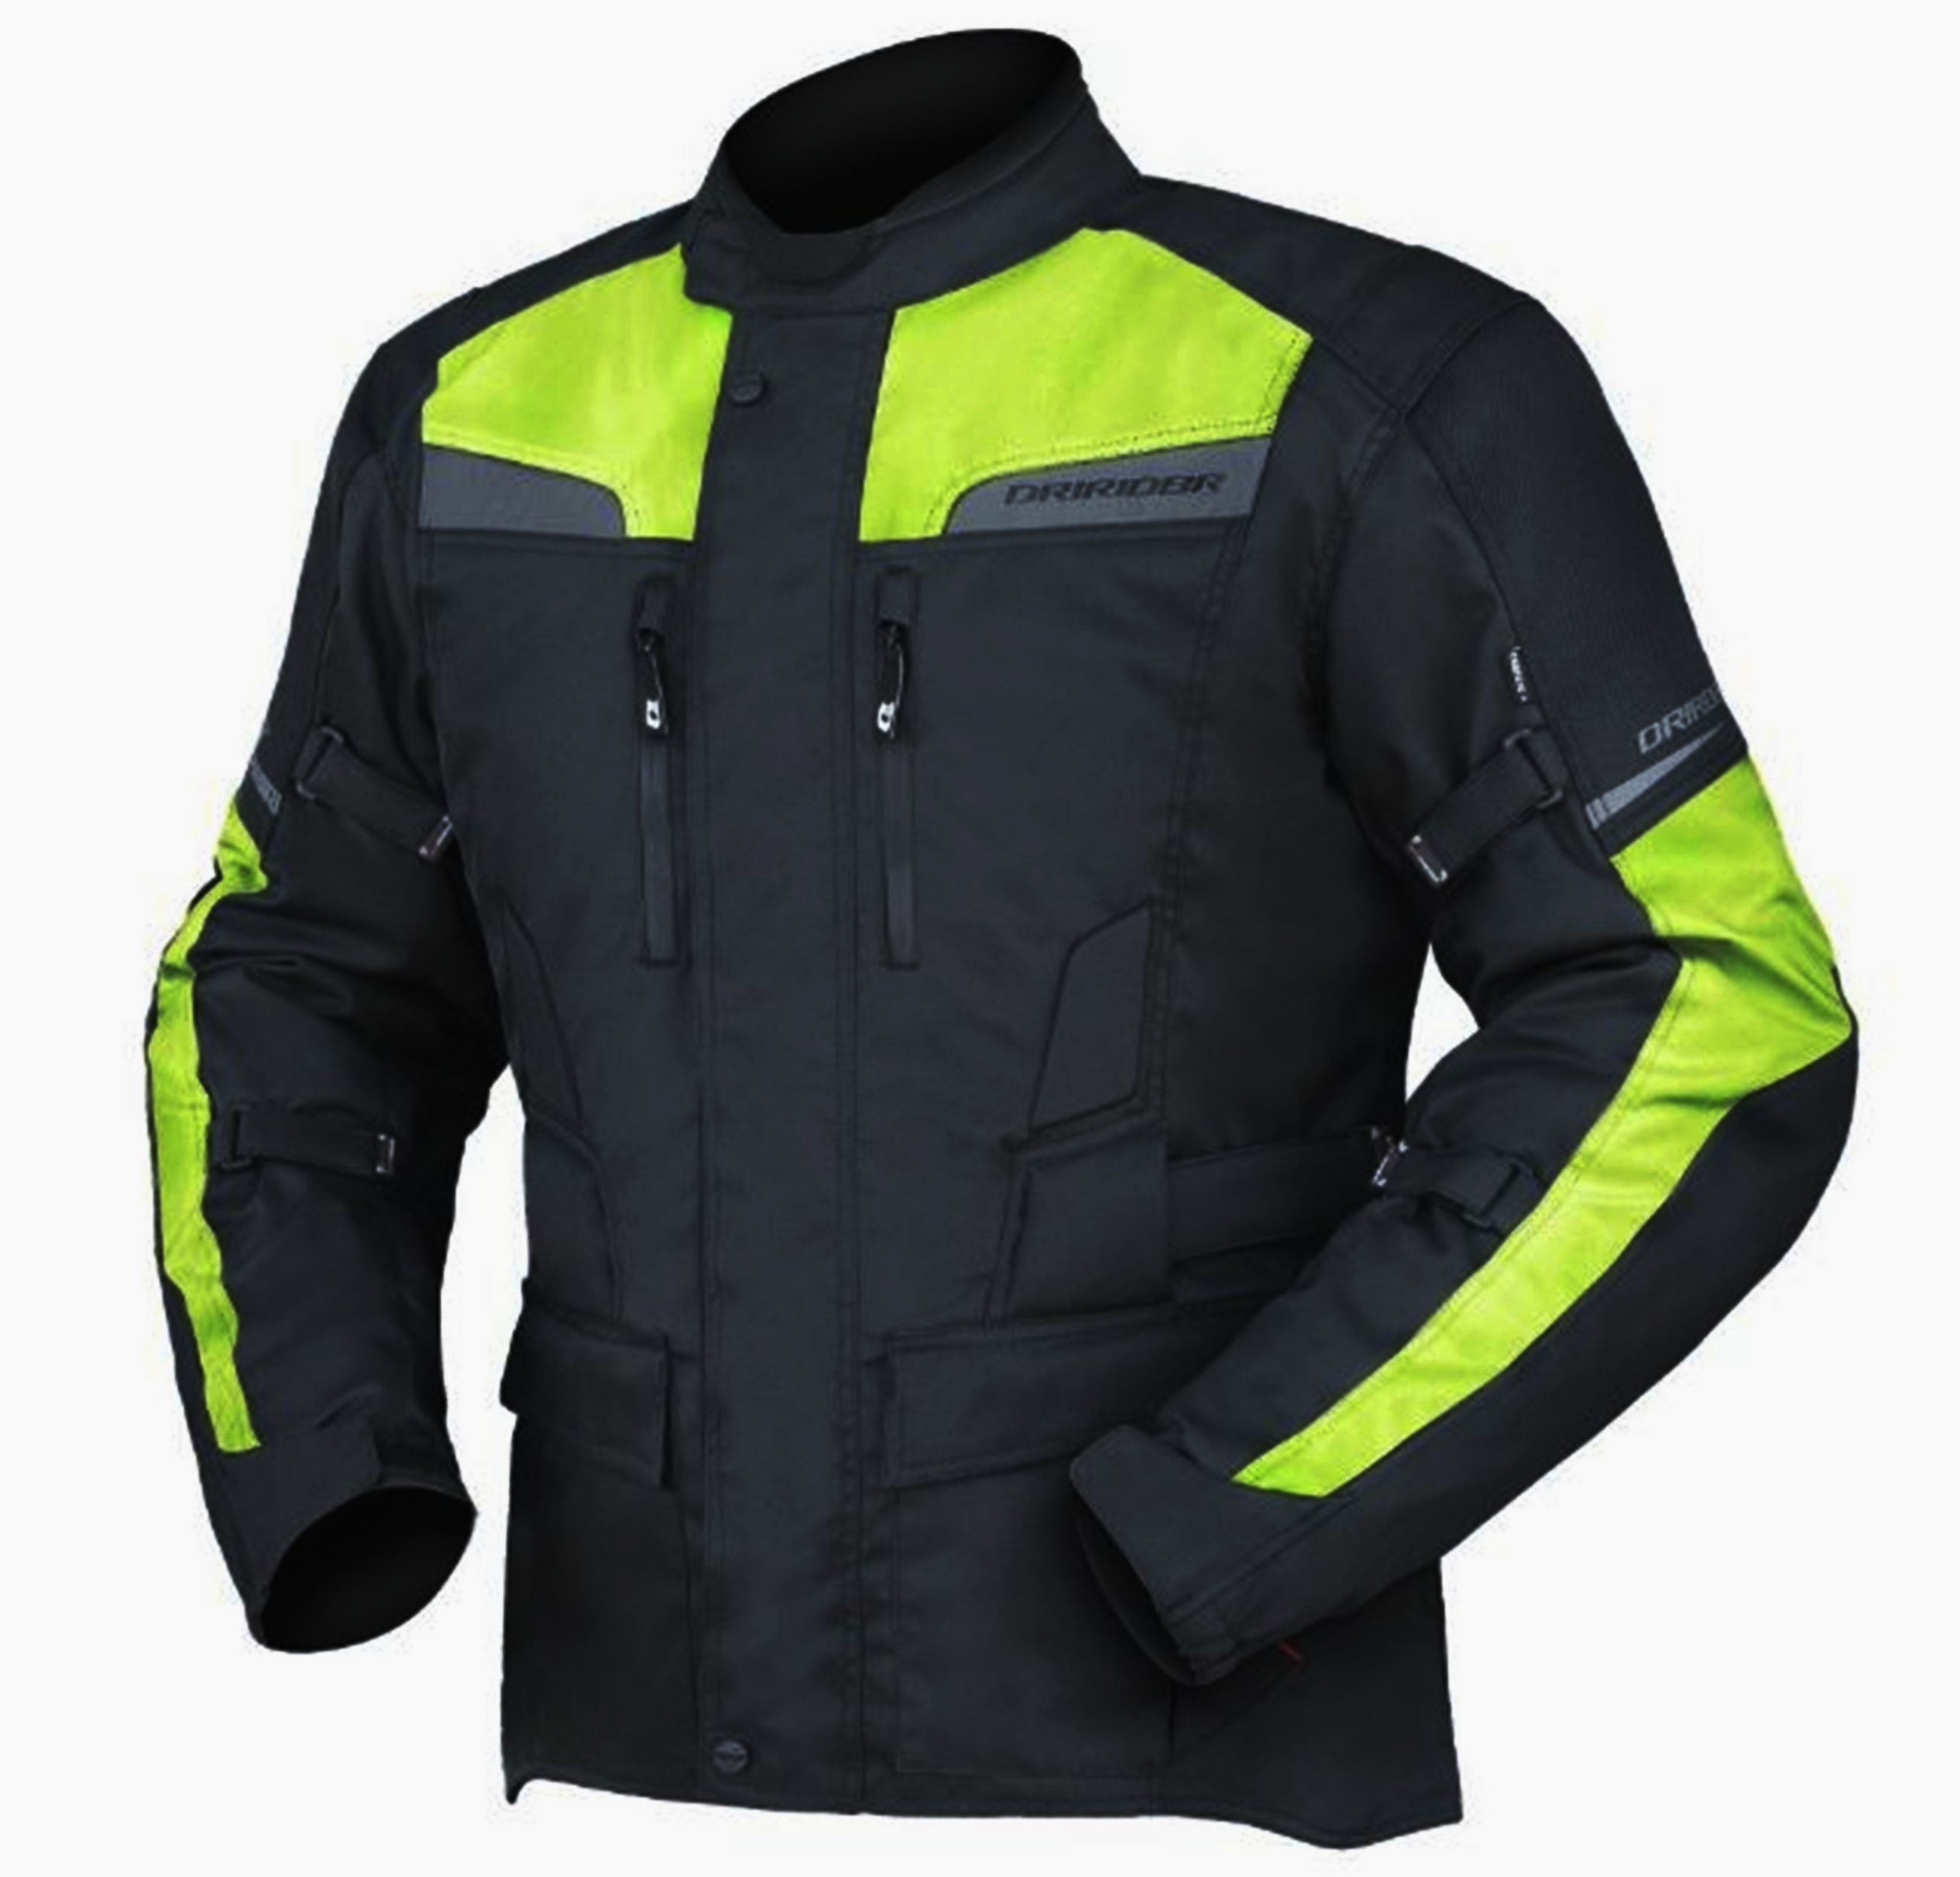 Summer Motorcycle Jacket >> DRIRIDER COMPASS 2 Motorcycle Jacket HI VIZ Fluoro Yellow - Bargain Bike Bits